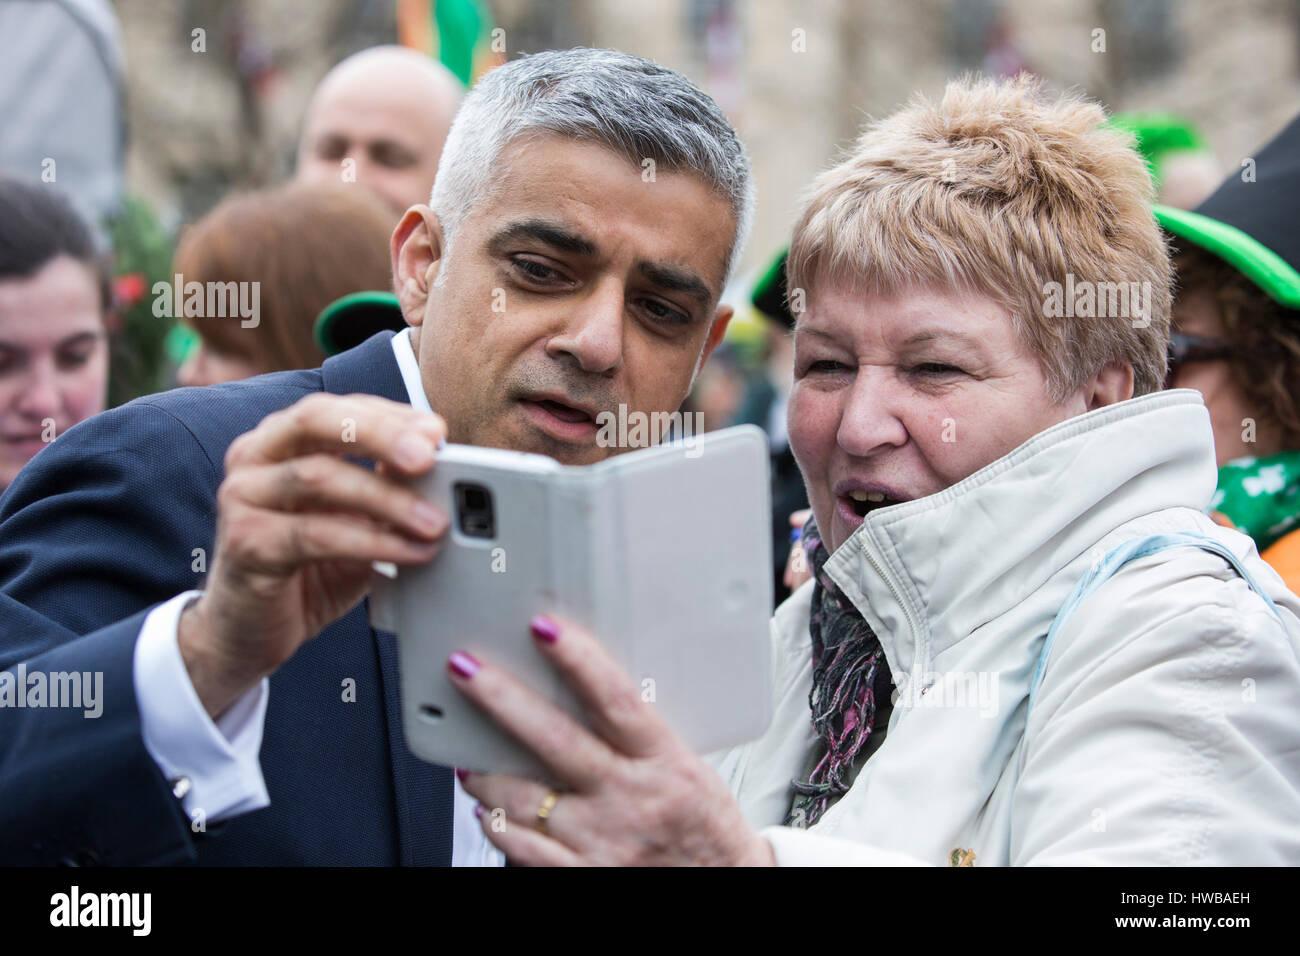 London, UK. 19 March 2017. London mayor Sadiq Khan has selfies done in Trafalgar Square. London celebrates St Patricks - Stock Image